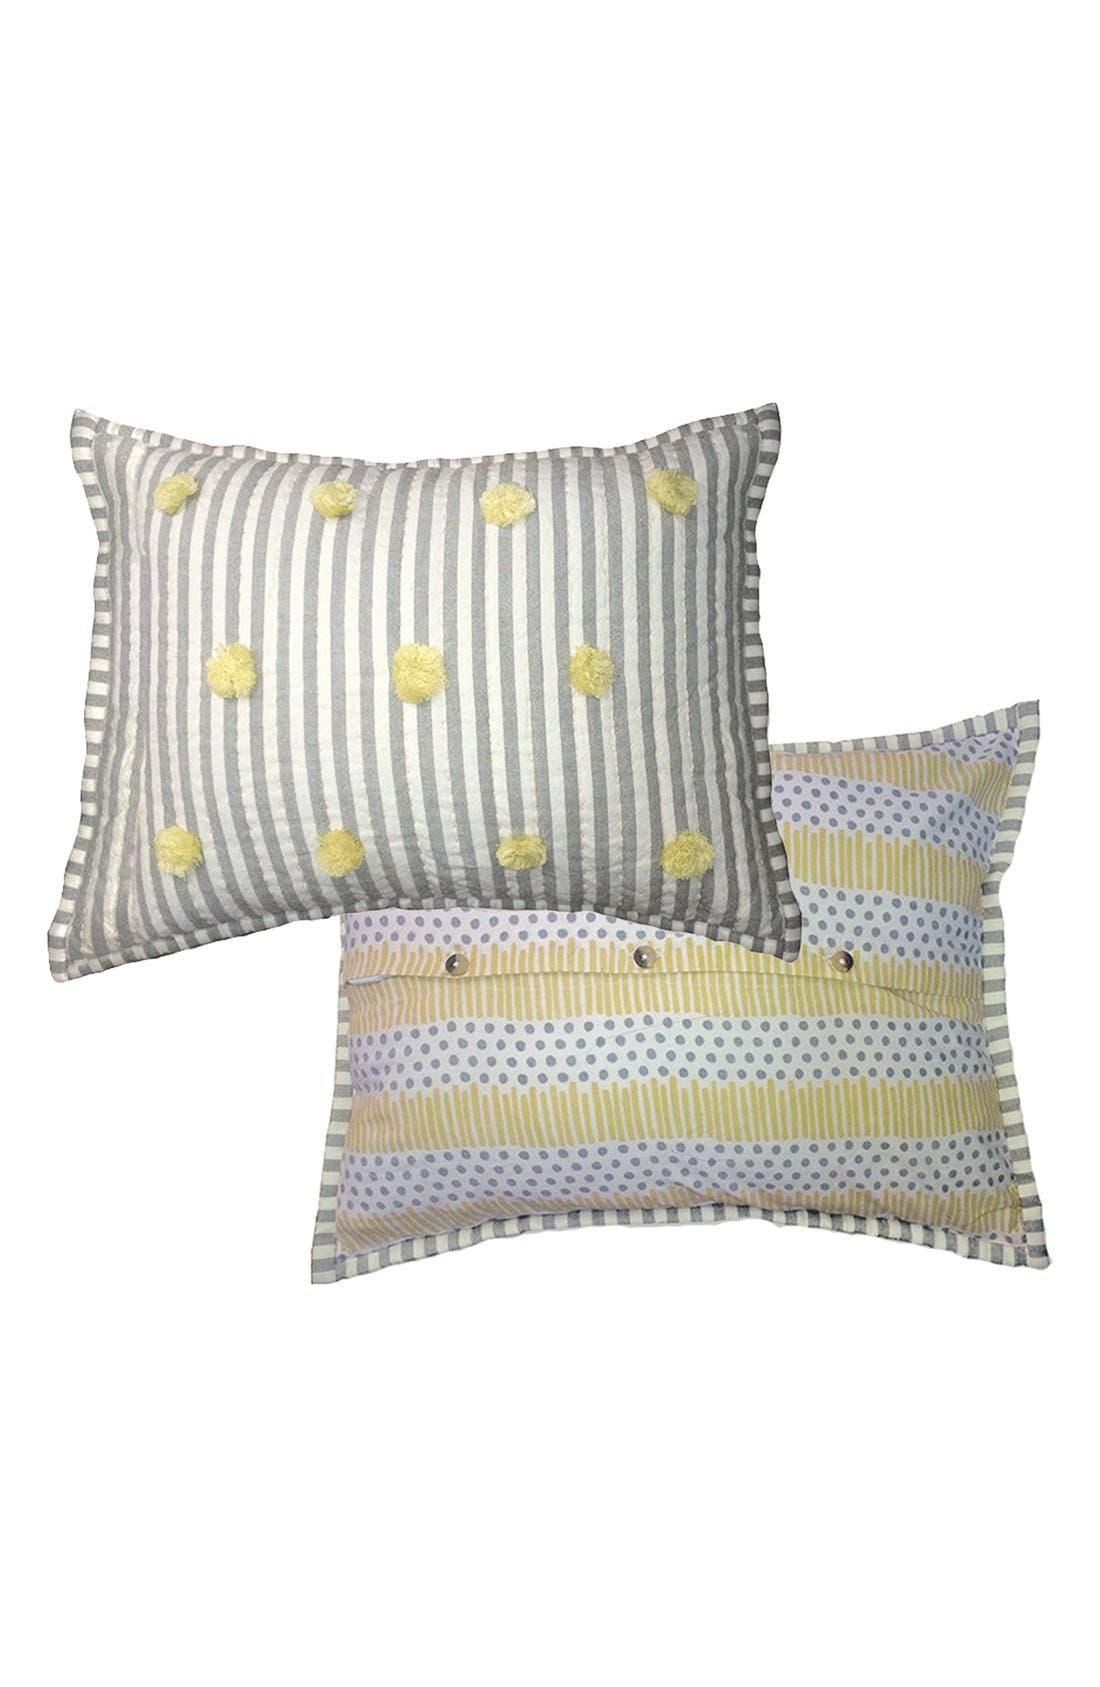 Alternate Image 1 Selected - Petit Pehr 'Rest My Little Head' Cotton Pillow